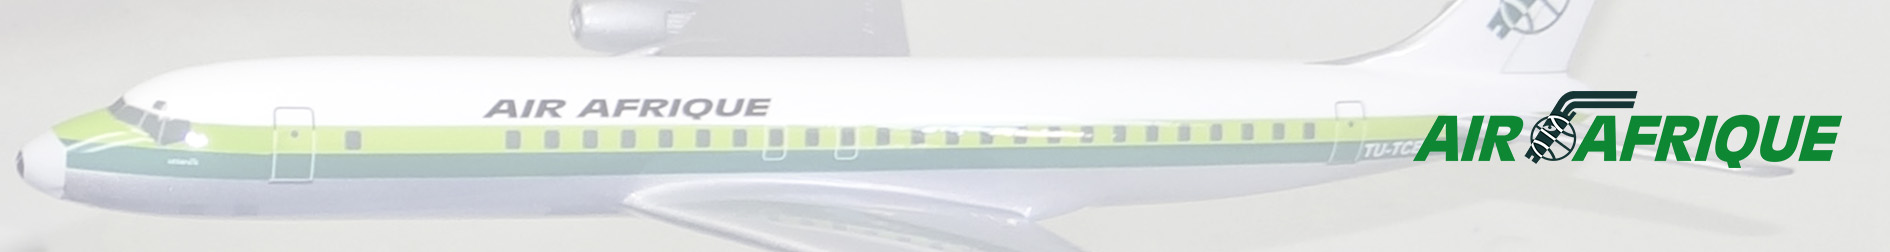 airafrique.jpg